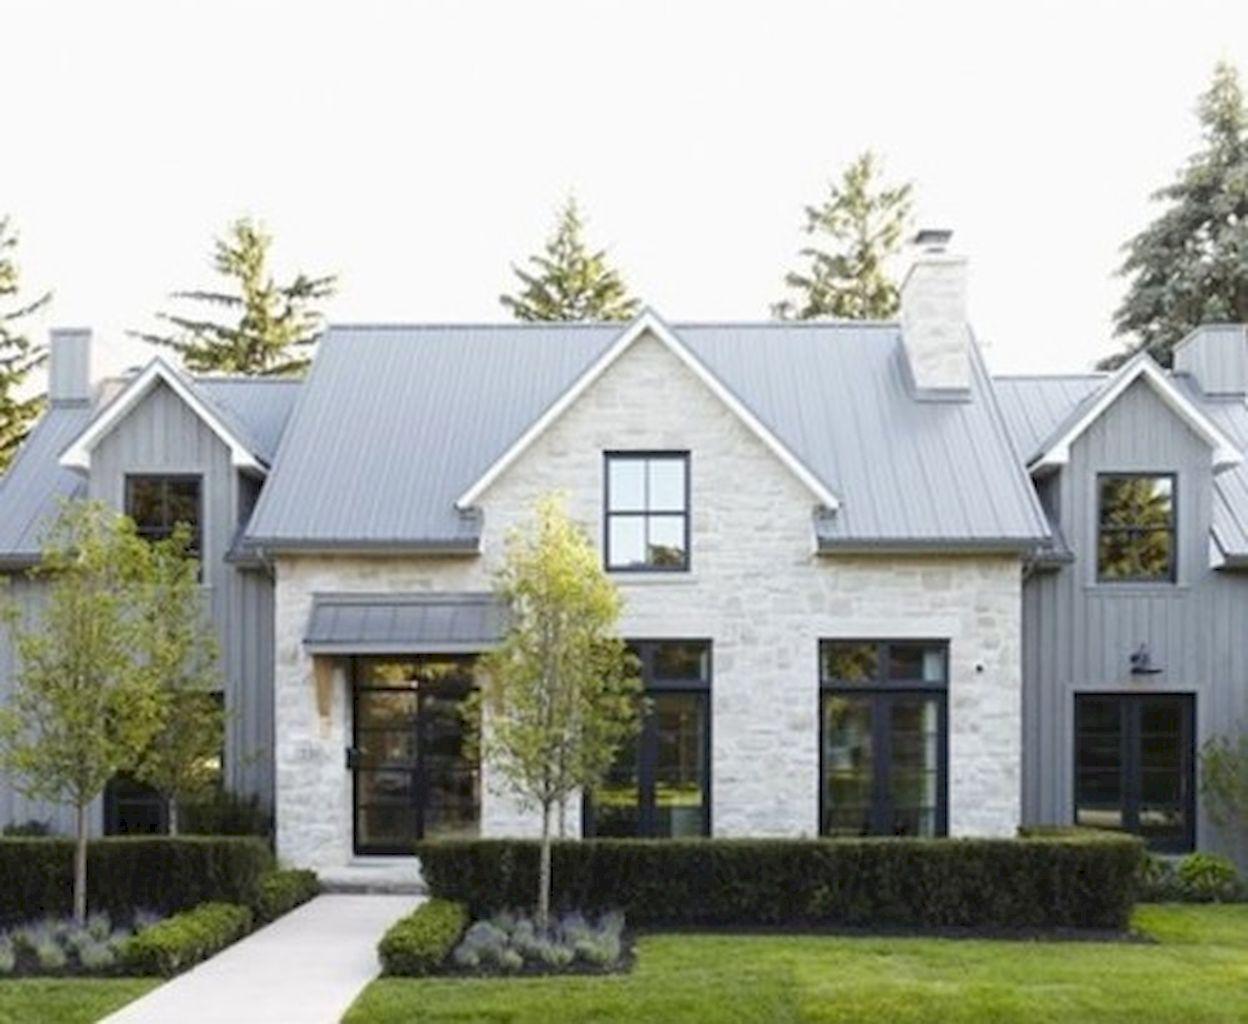 70 stunning farmhouse exterior design ideas (64 | Exterior design ...